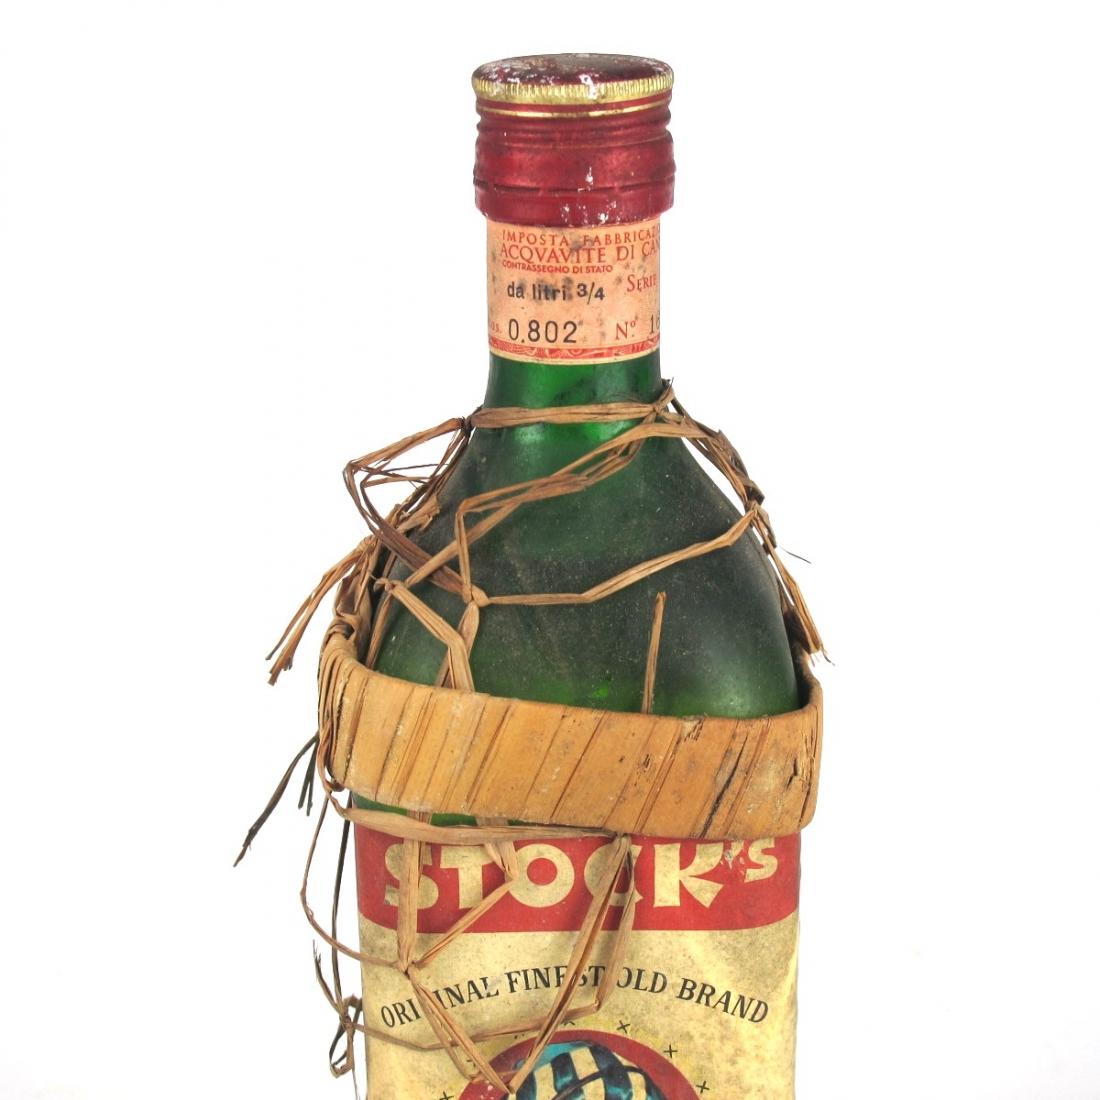 Stock's Jamaica Rum 1960s/1970s